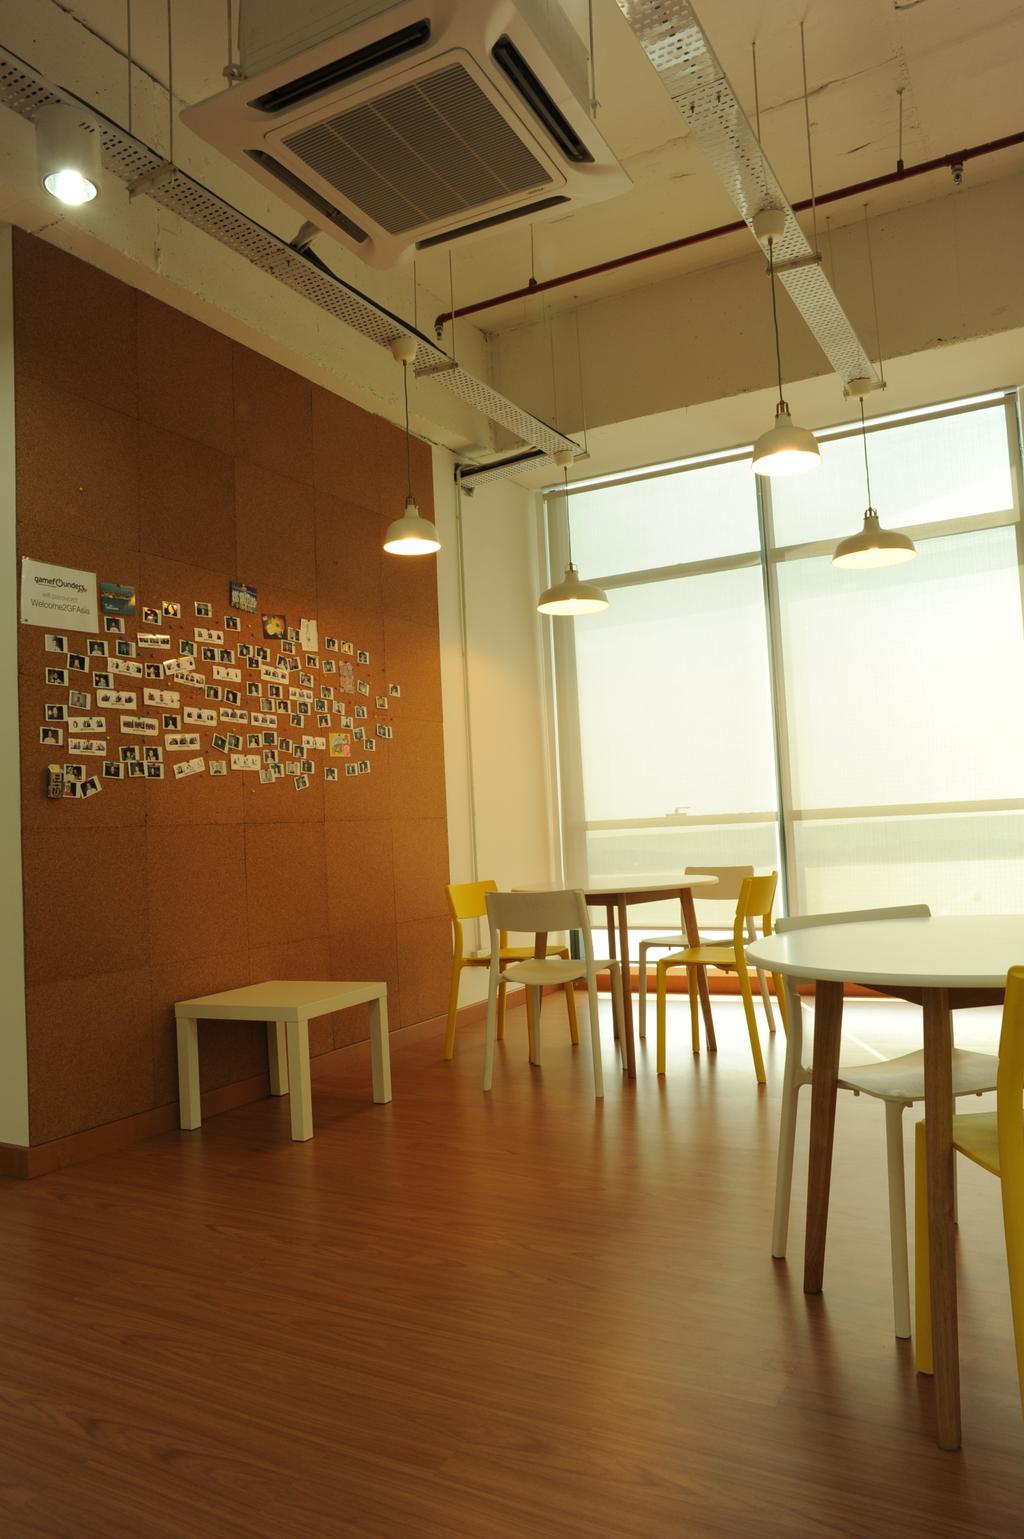 Vertical - Gamefounder, Commercial, Interior Designer, IQI Concept Interior Design & Renovation, Modern, Bar Stool, Furniture, Chair, Dining Room, Indoors, Interior Design, Room, Dining Table, Table